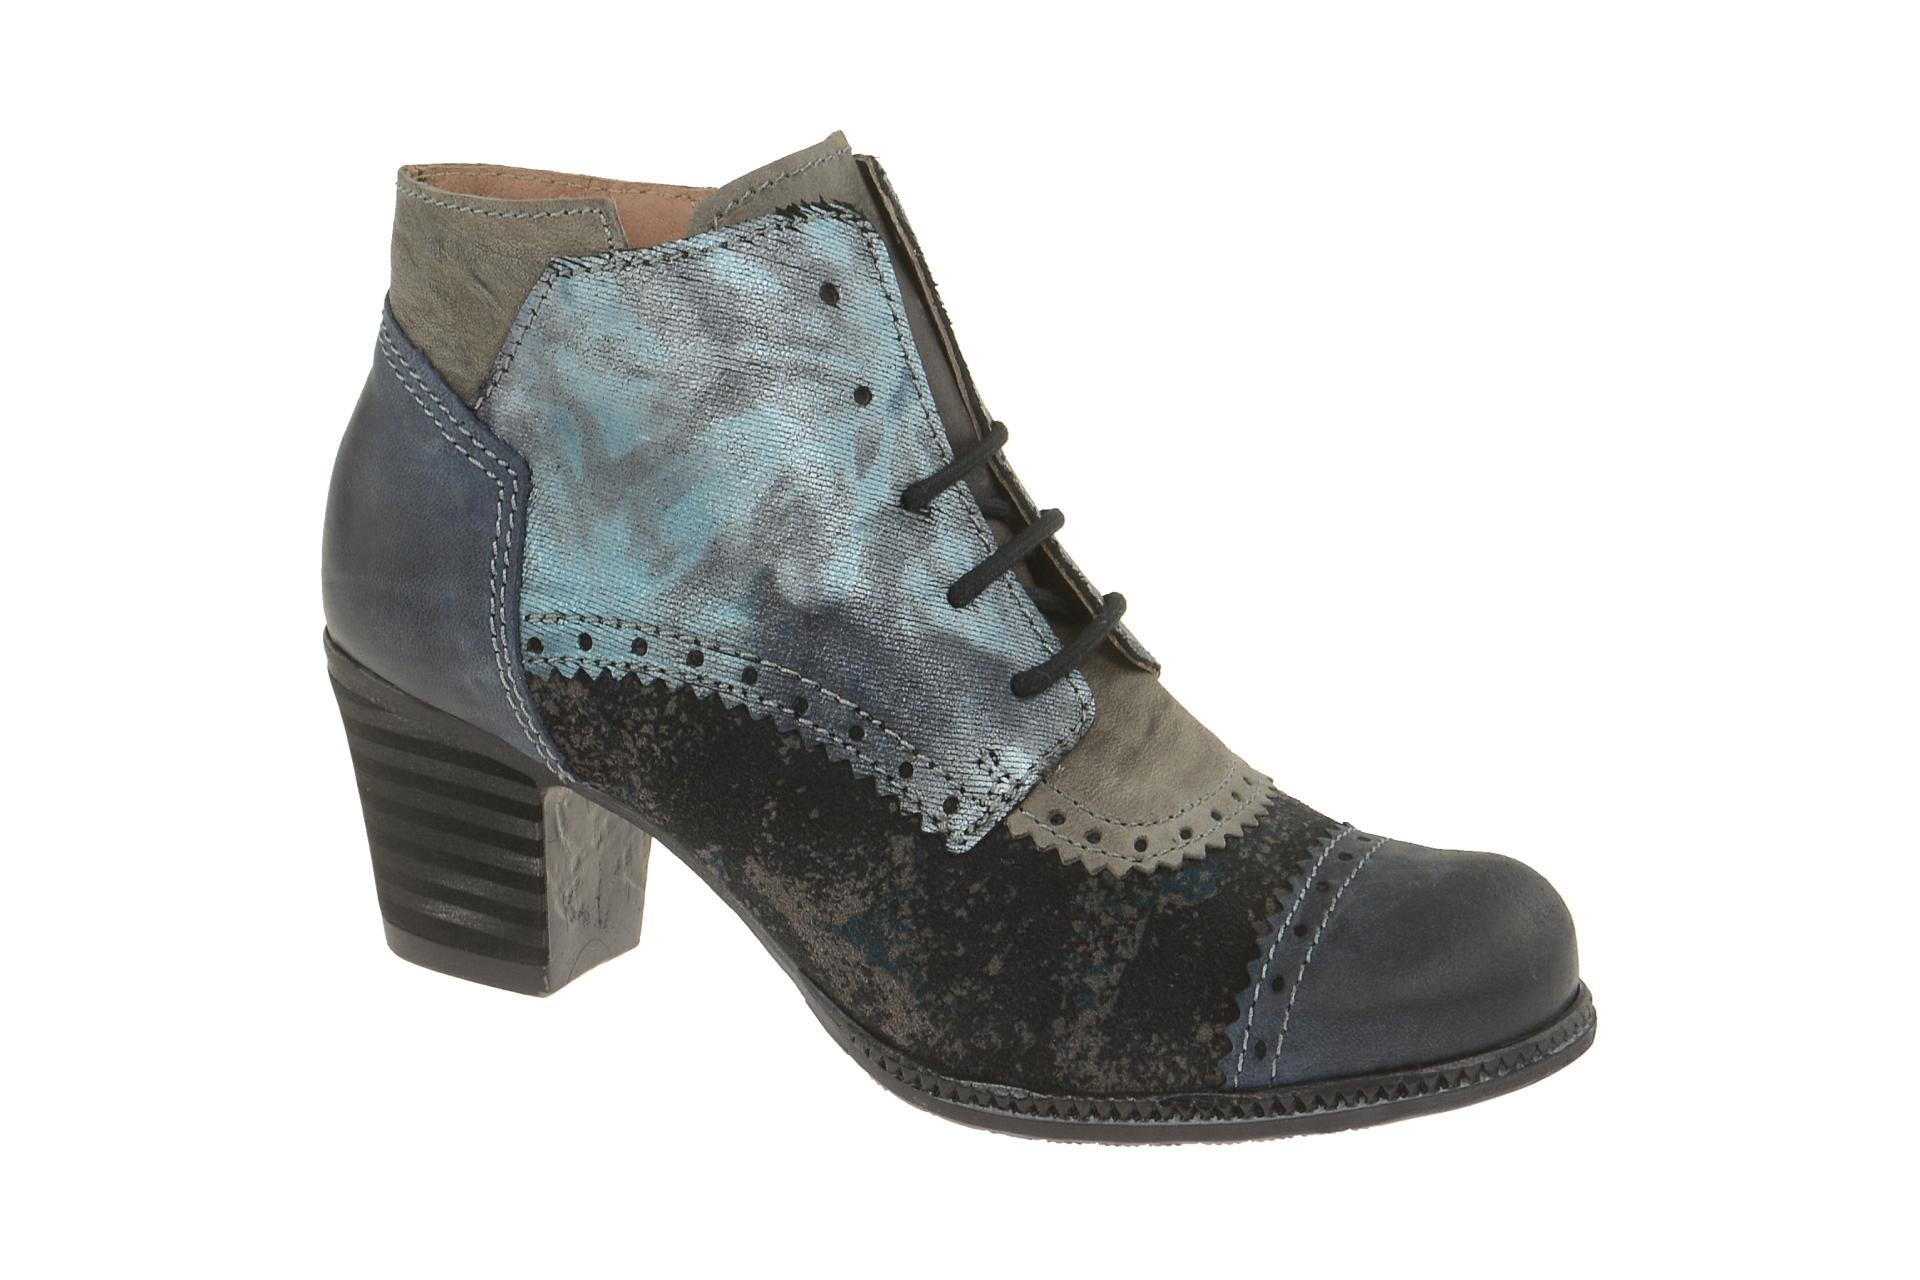 finest selection 6131b b88ee Charme Stiefelette blau grau kombi 5576